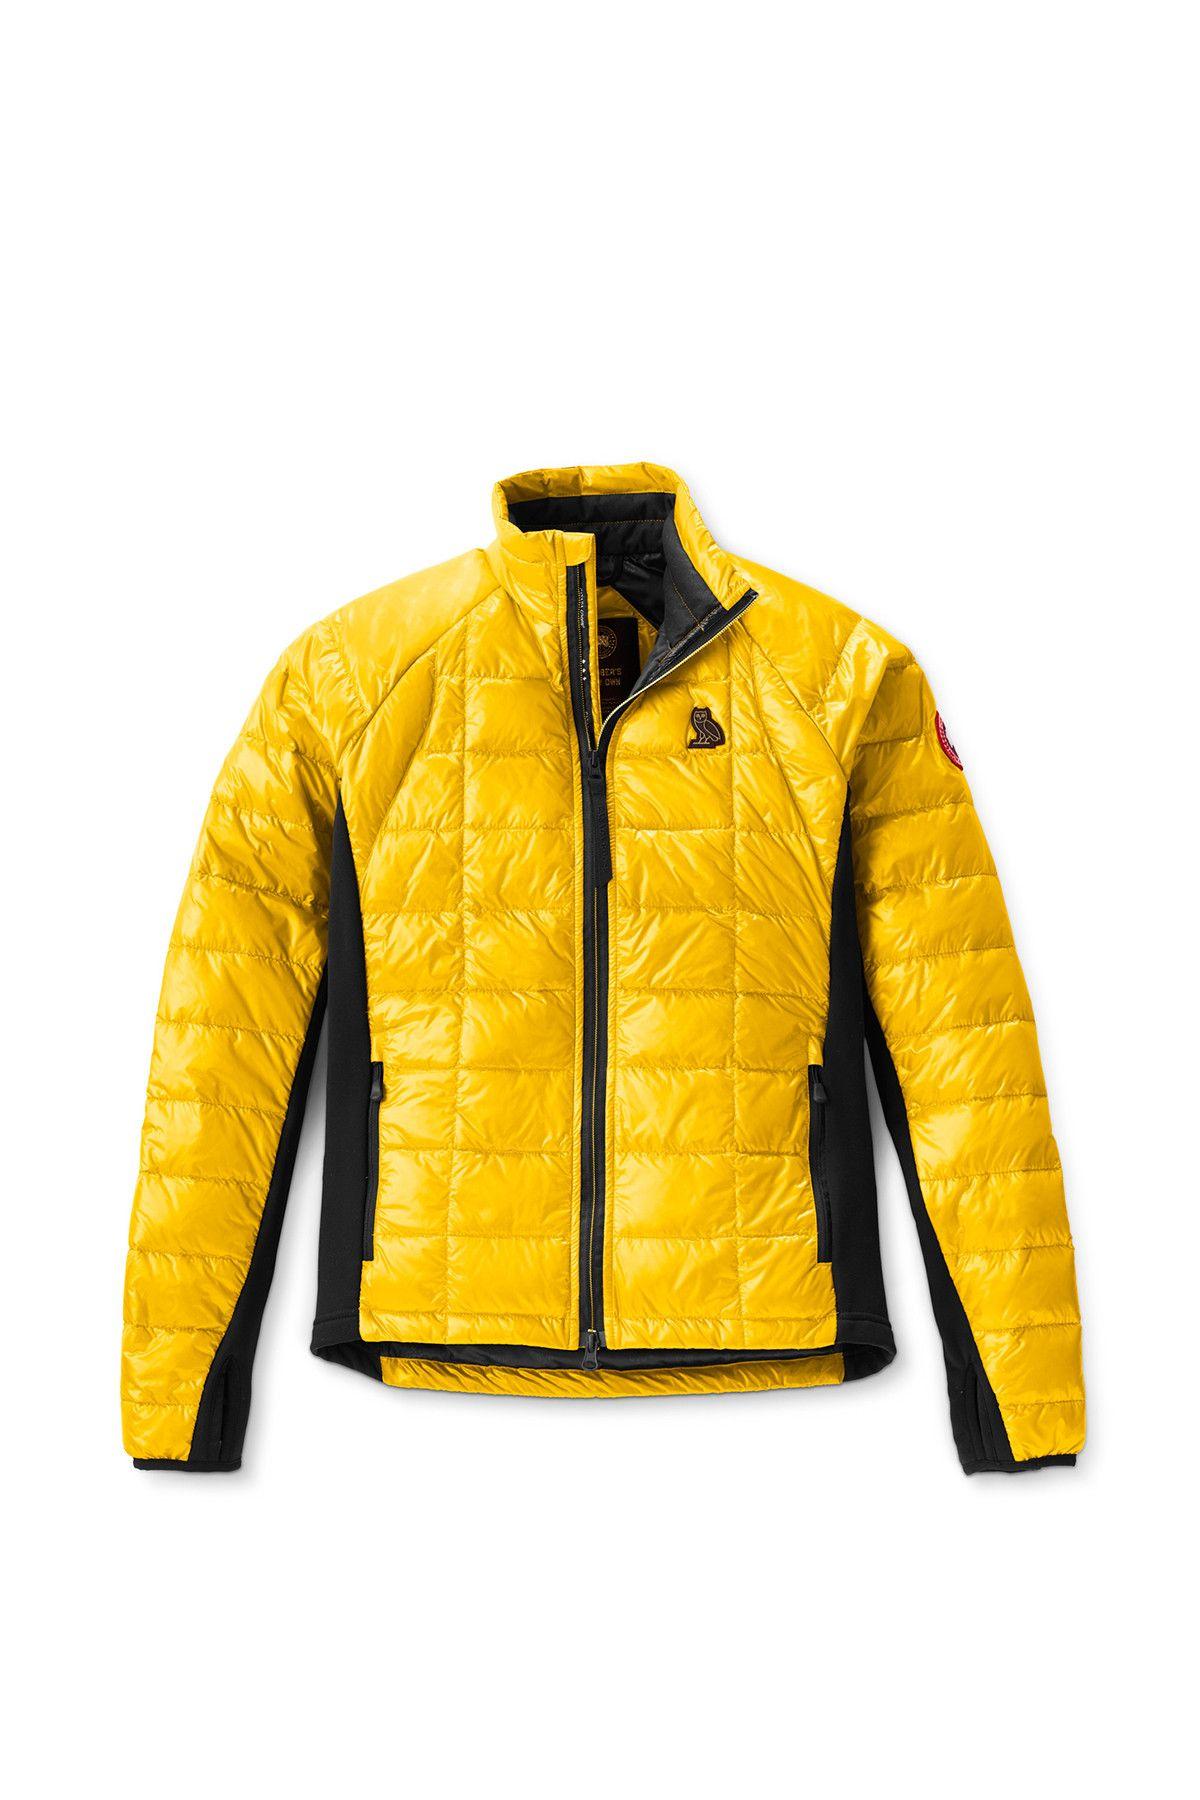 9e23bde16dca ovo canada goose collaboration fall winter 2018 hybridge jacket yellow  white orange black drake august 24 drop release date look info news sneak  peak ...